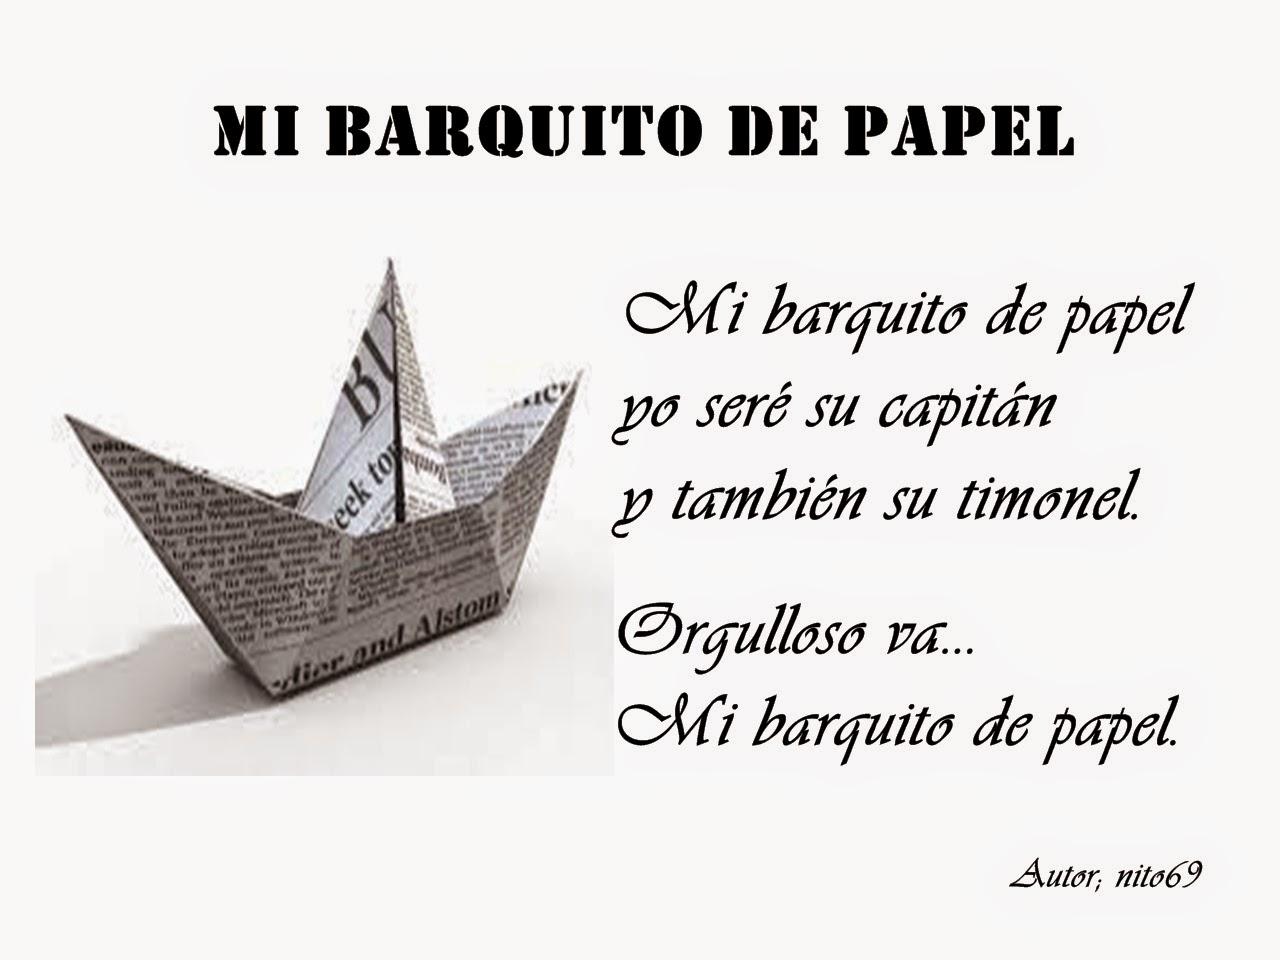 MI BARQUITO DE PAPEL .